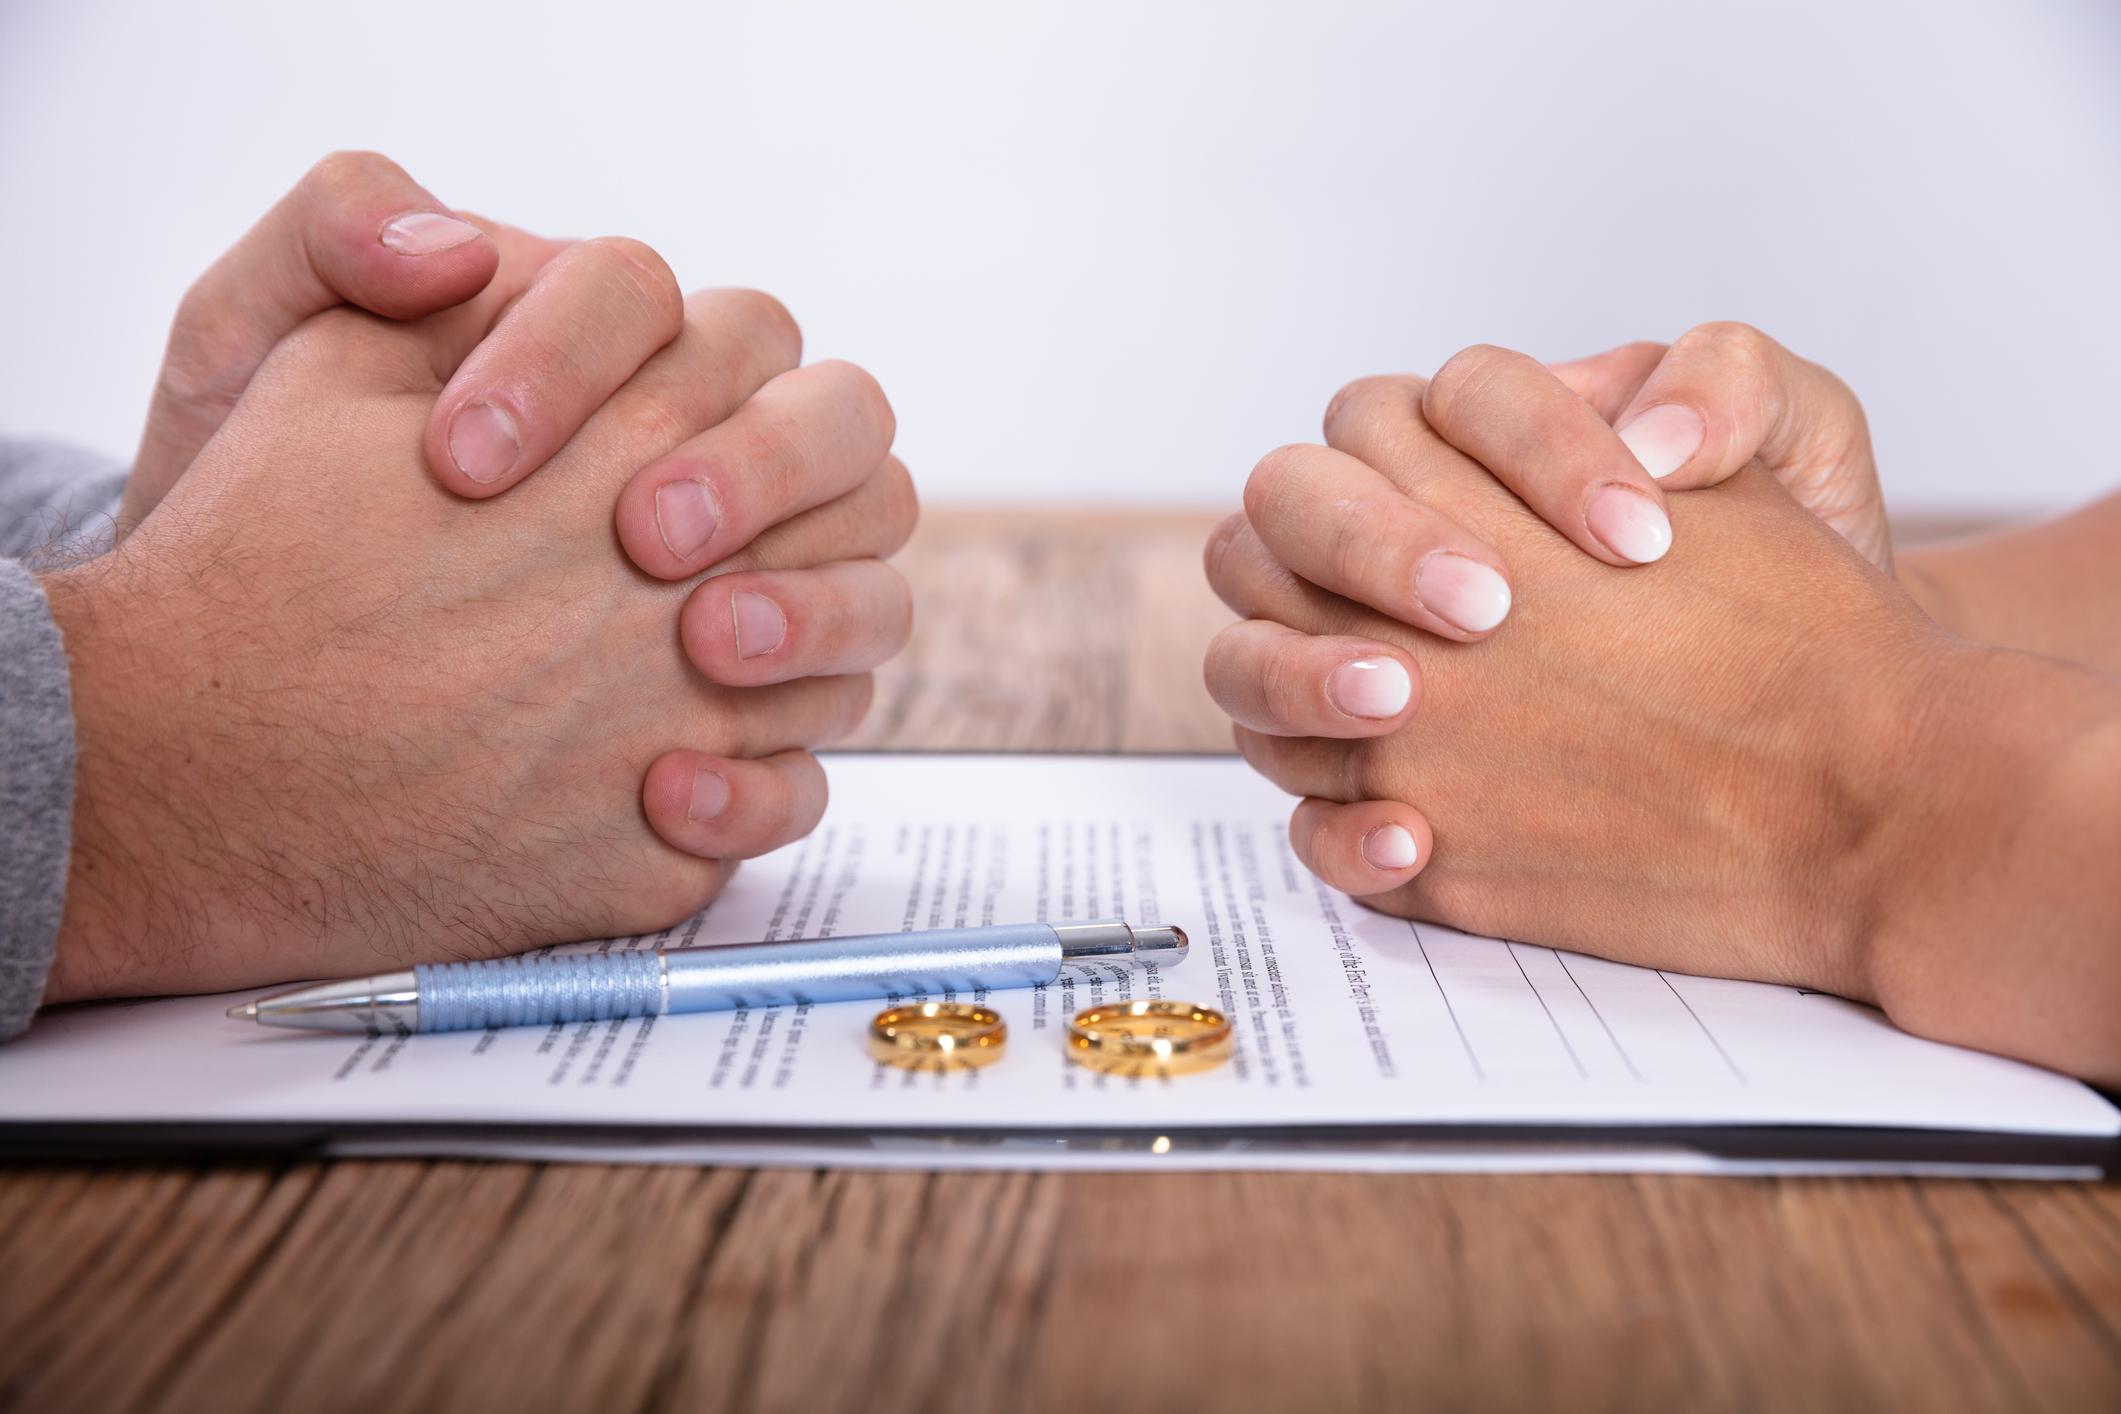 Singlehood-widowed or divorced El Segundo, CA California Retirement Advisors